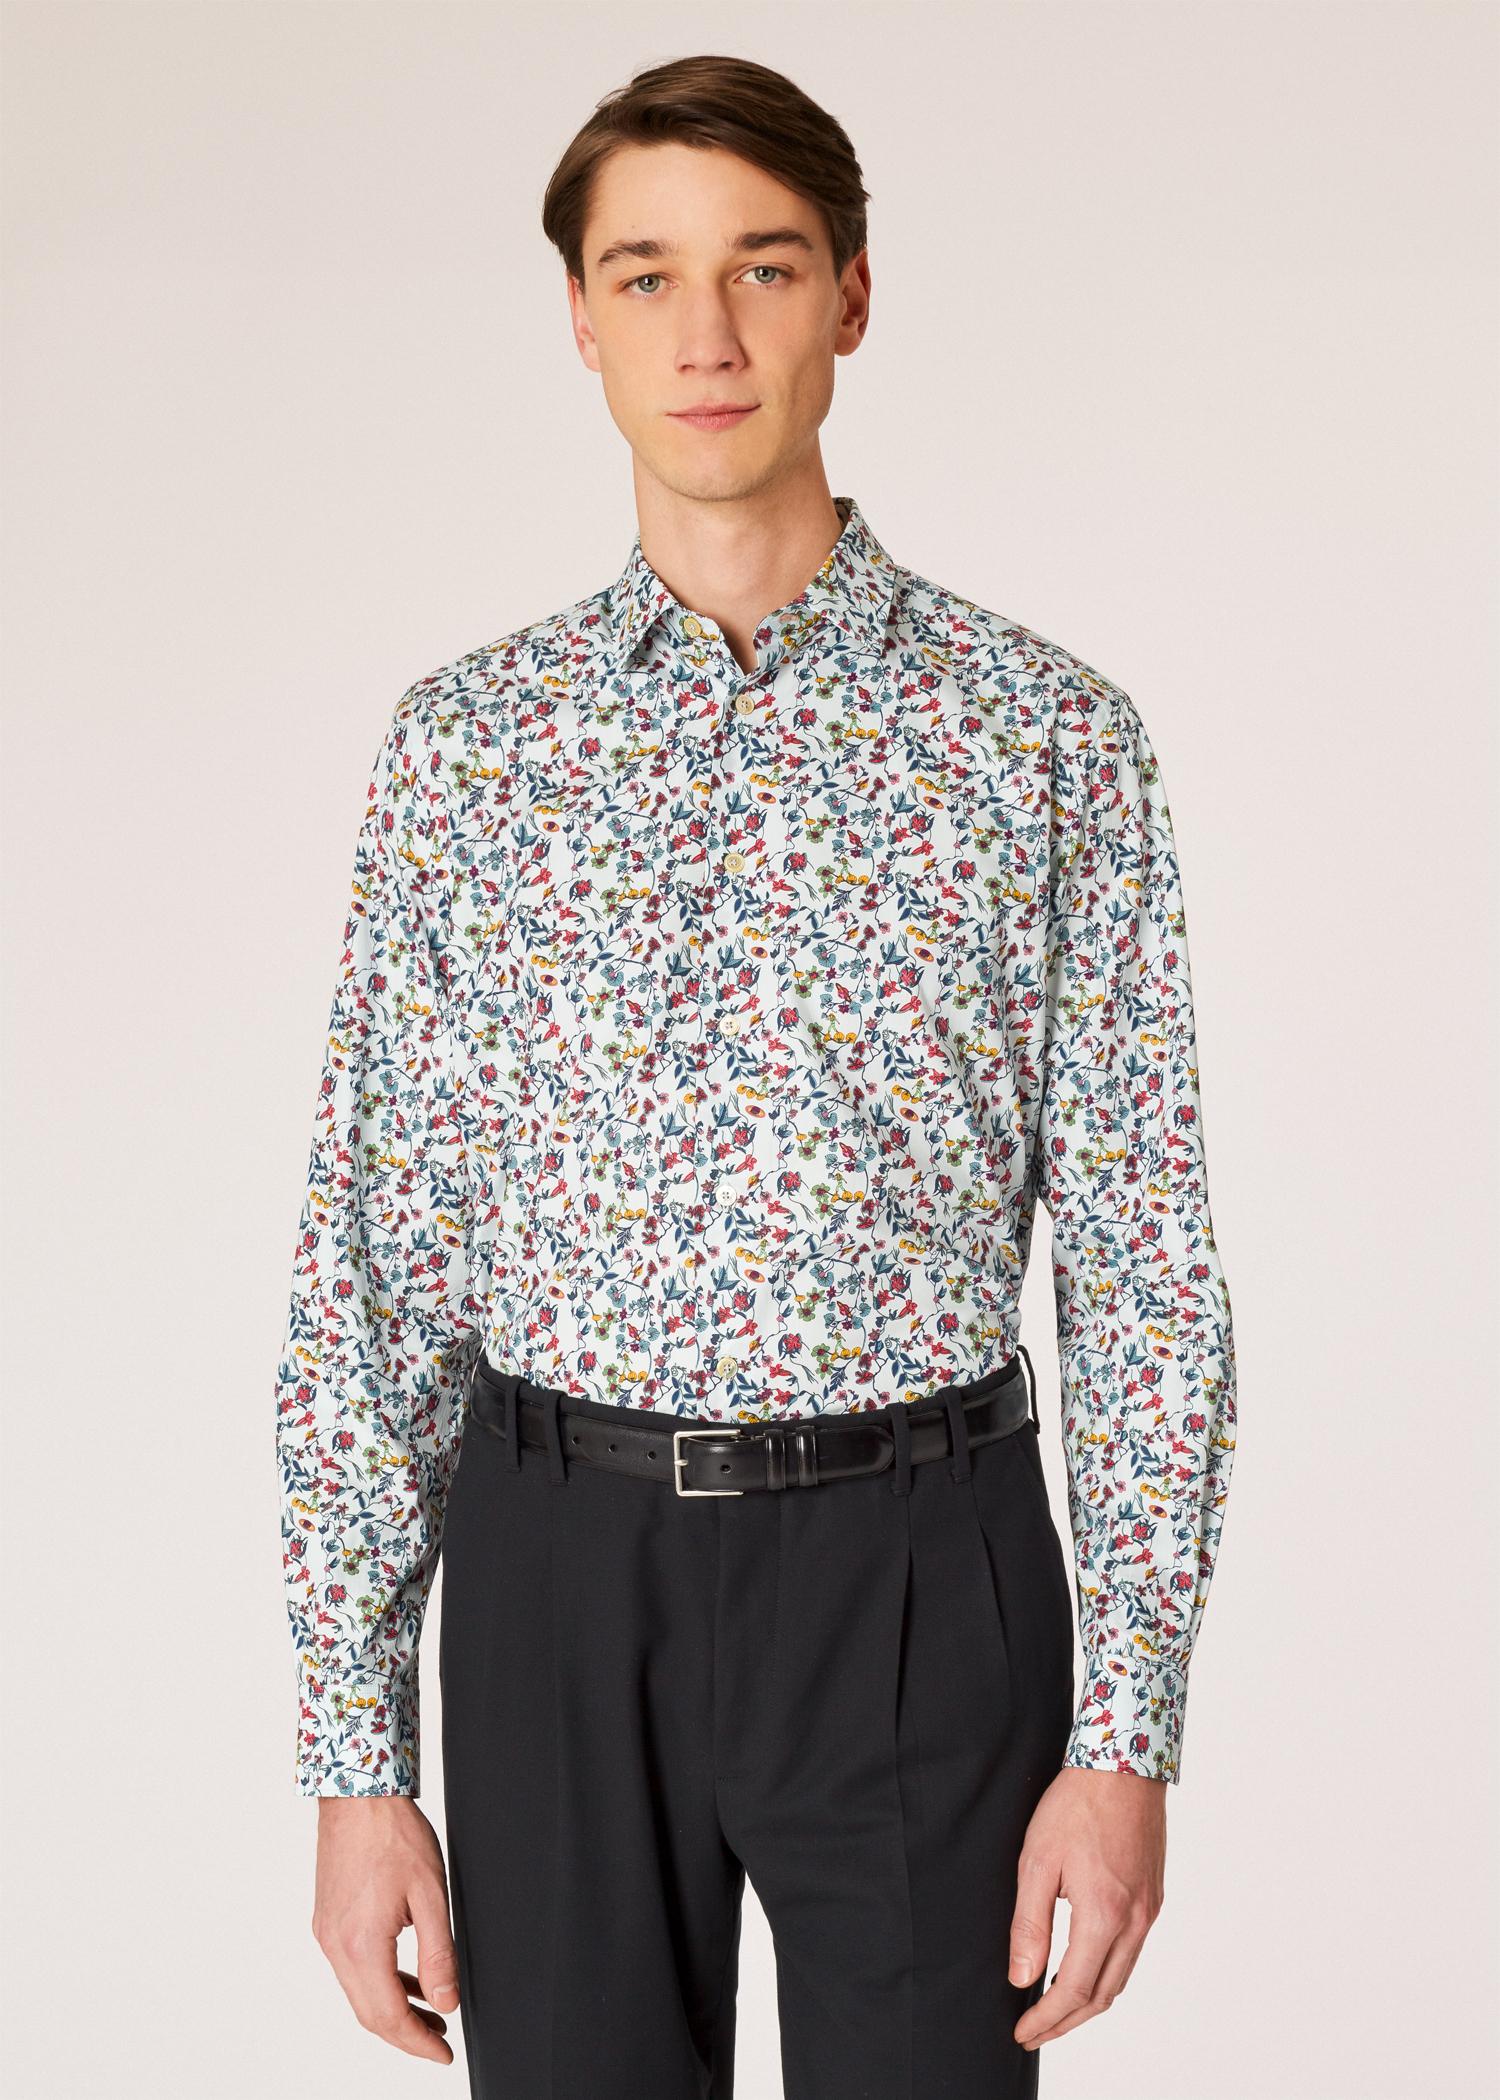 d0b70078c9a650 Model front close up - Men's Classic-Fit 'Explorer Floral' Print Shirt With